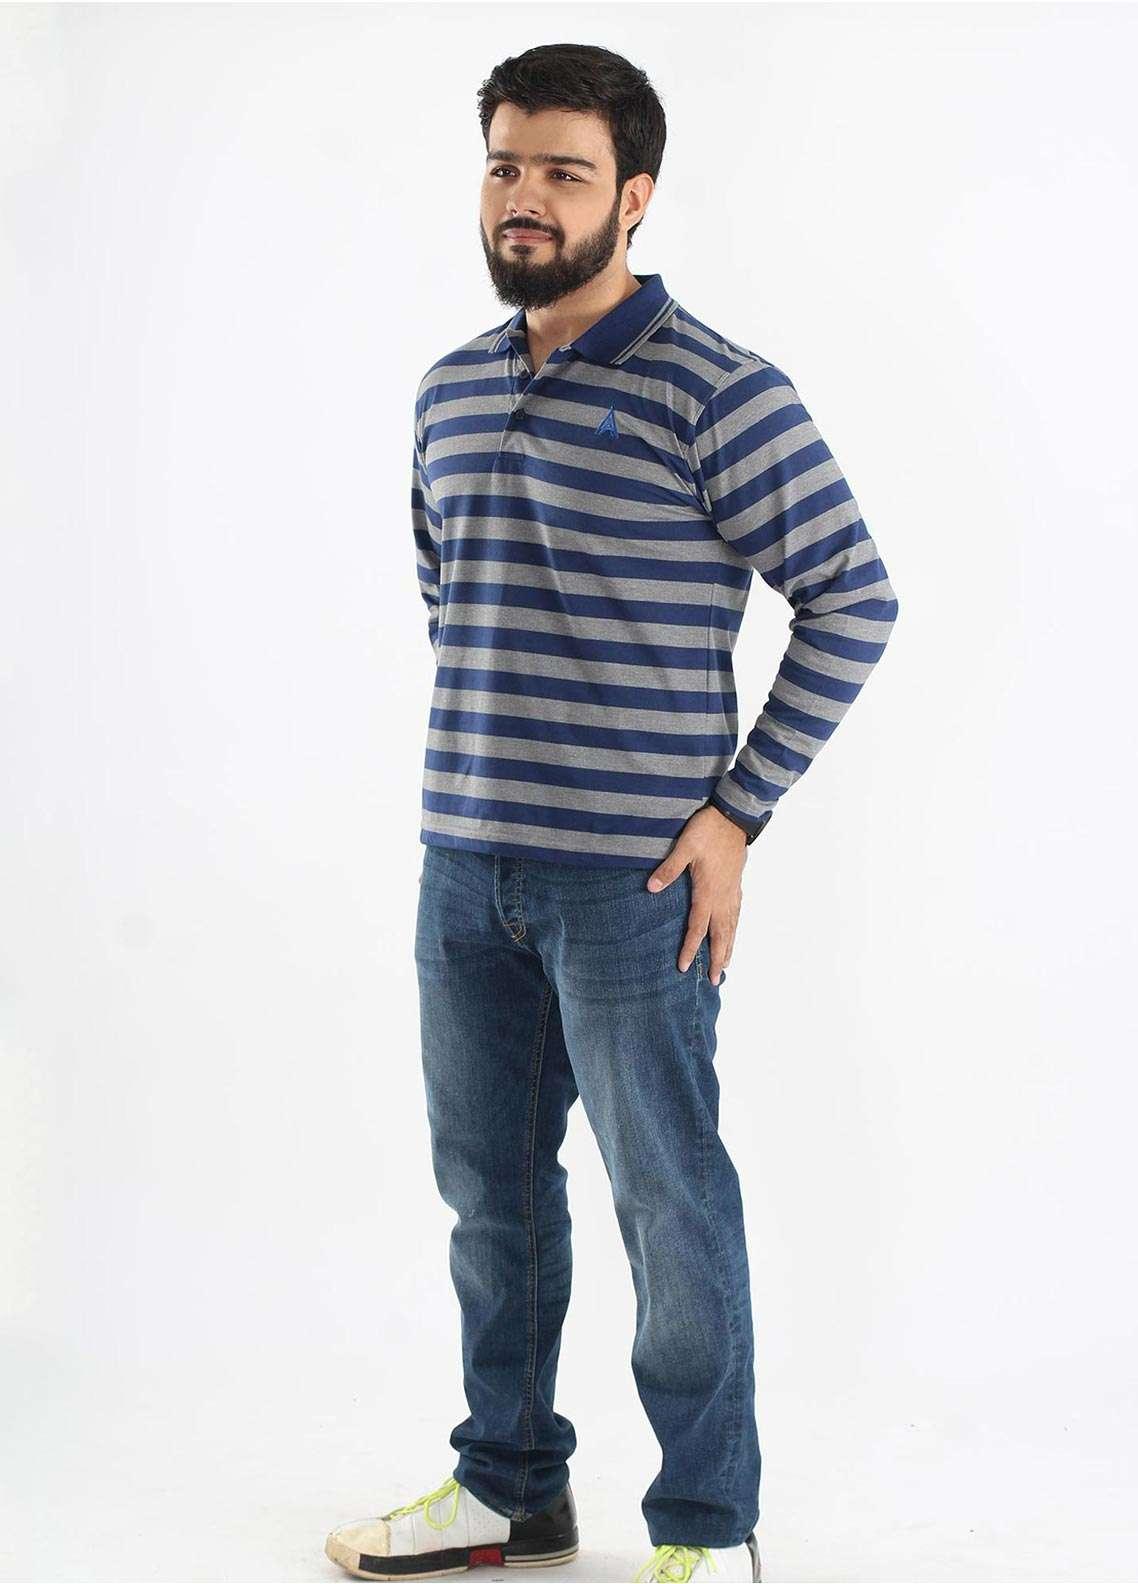 Anchor Jersey Polo Men T-Shirts - Multi A-217